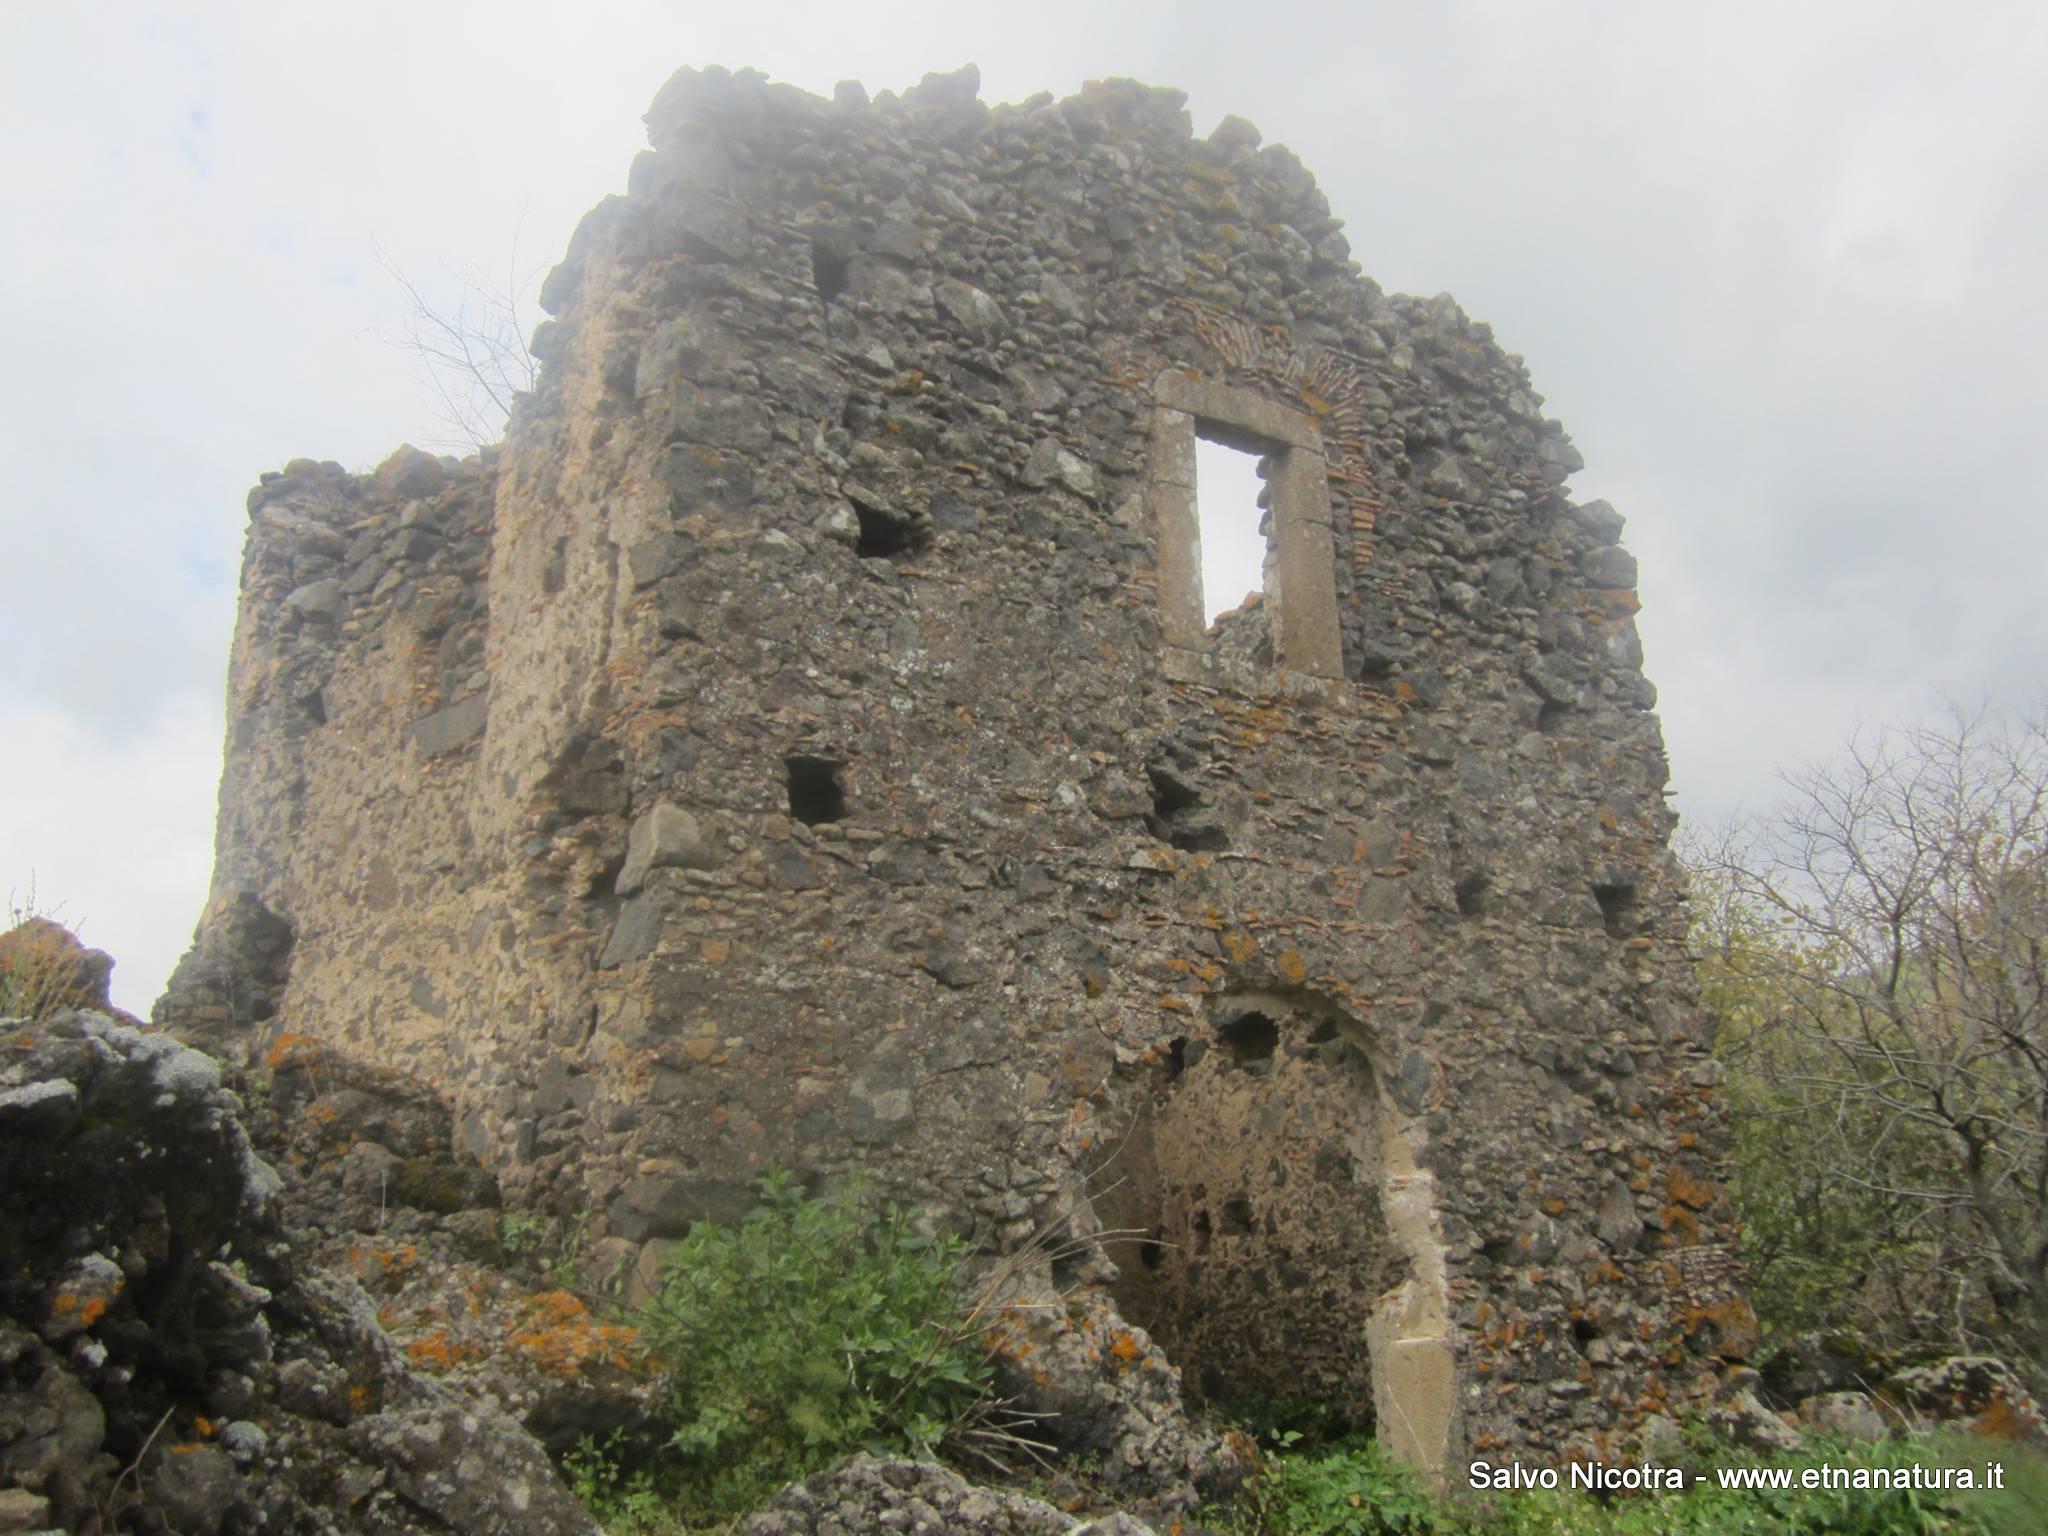 Torre Ciaramella